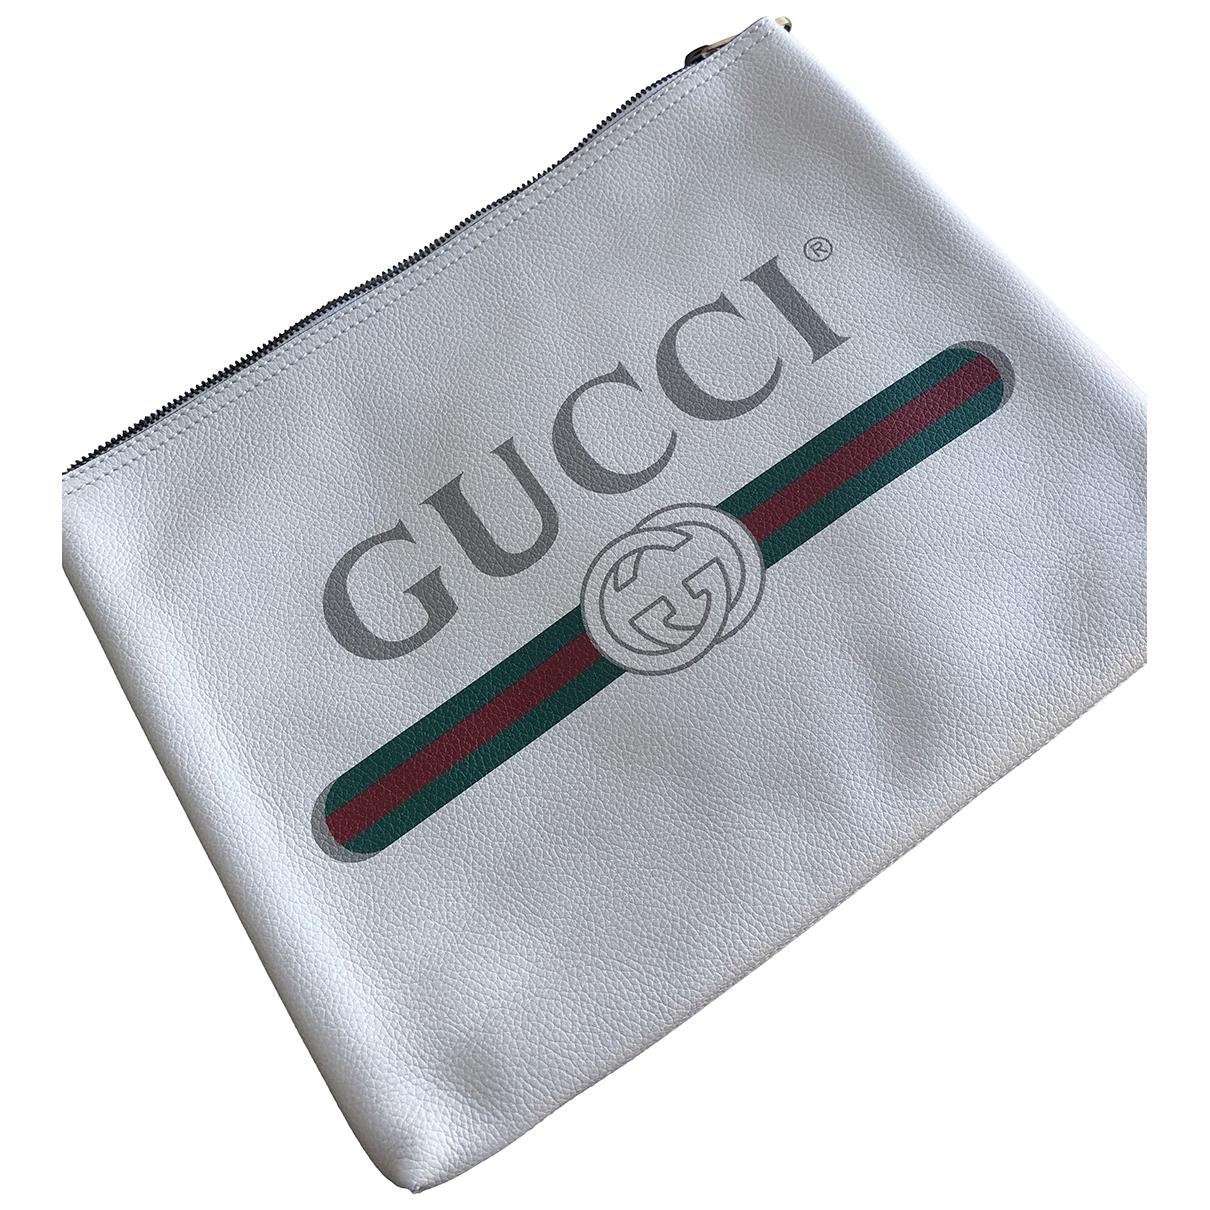 Gucci \N White Leather Clutch bag for Women \N